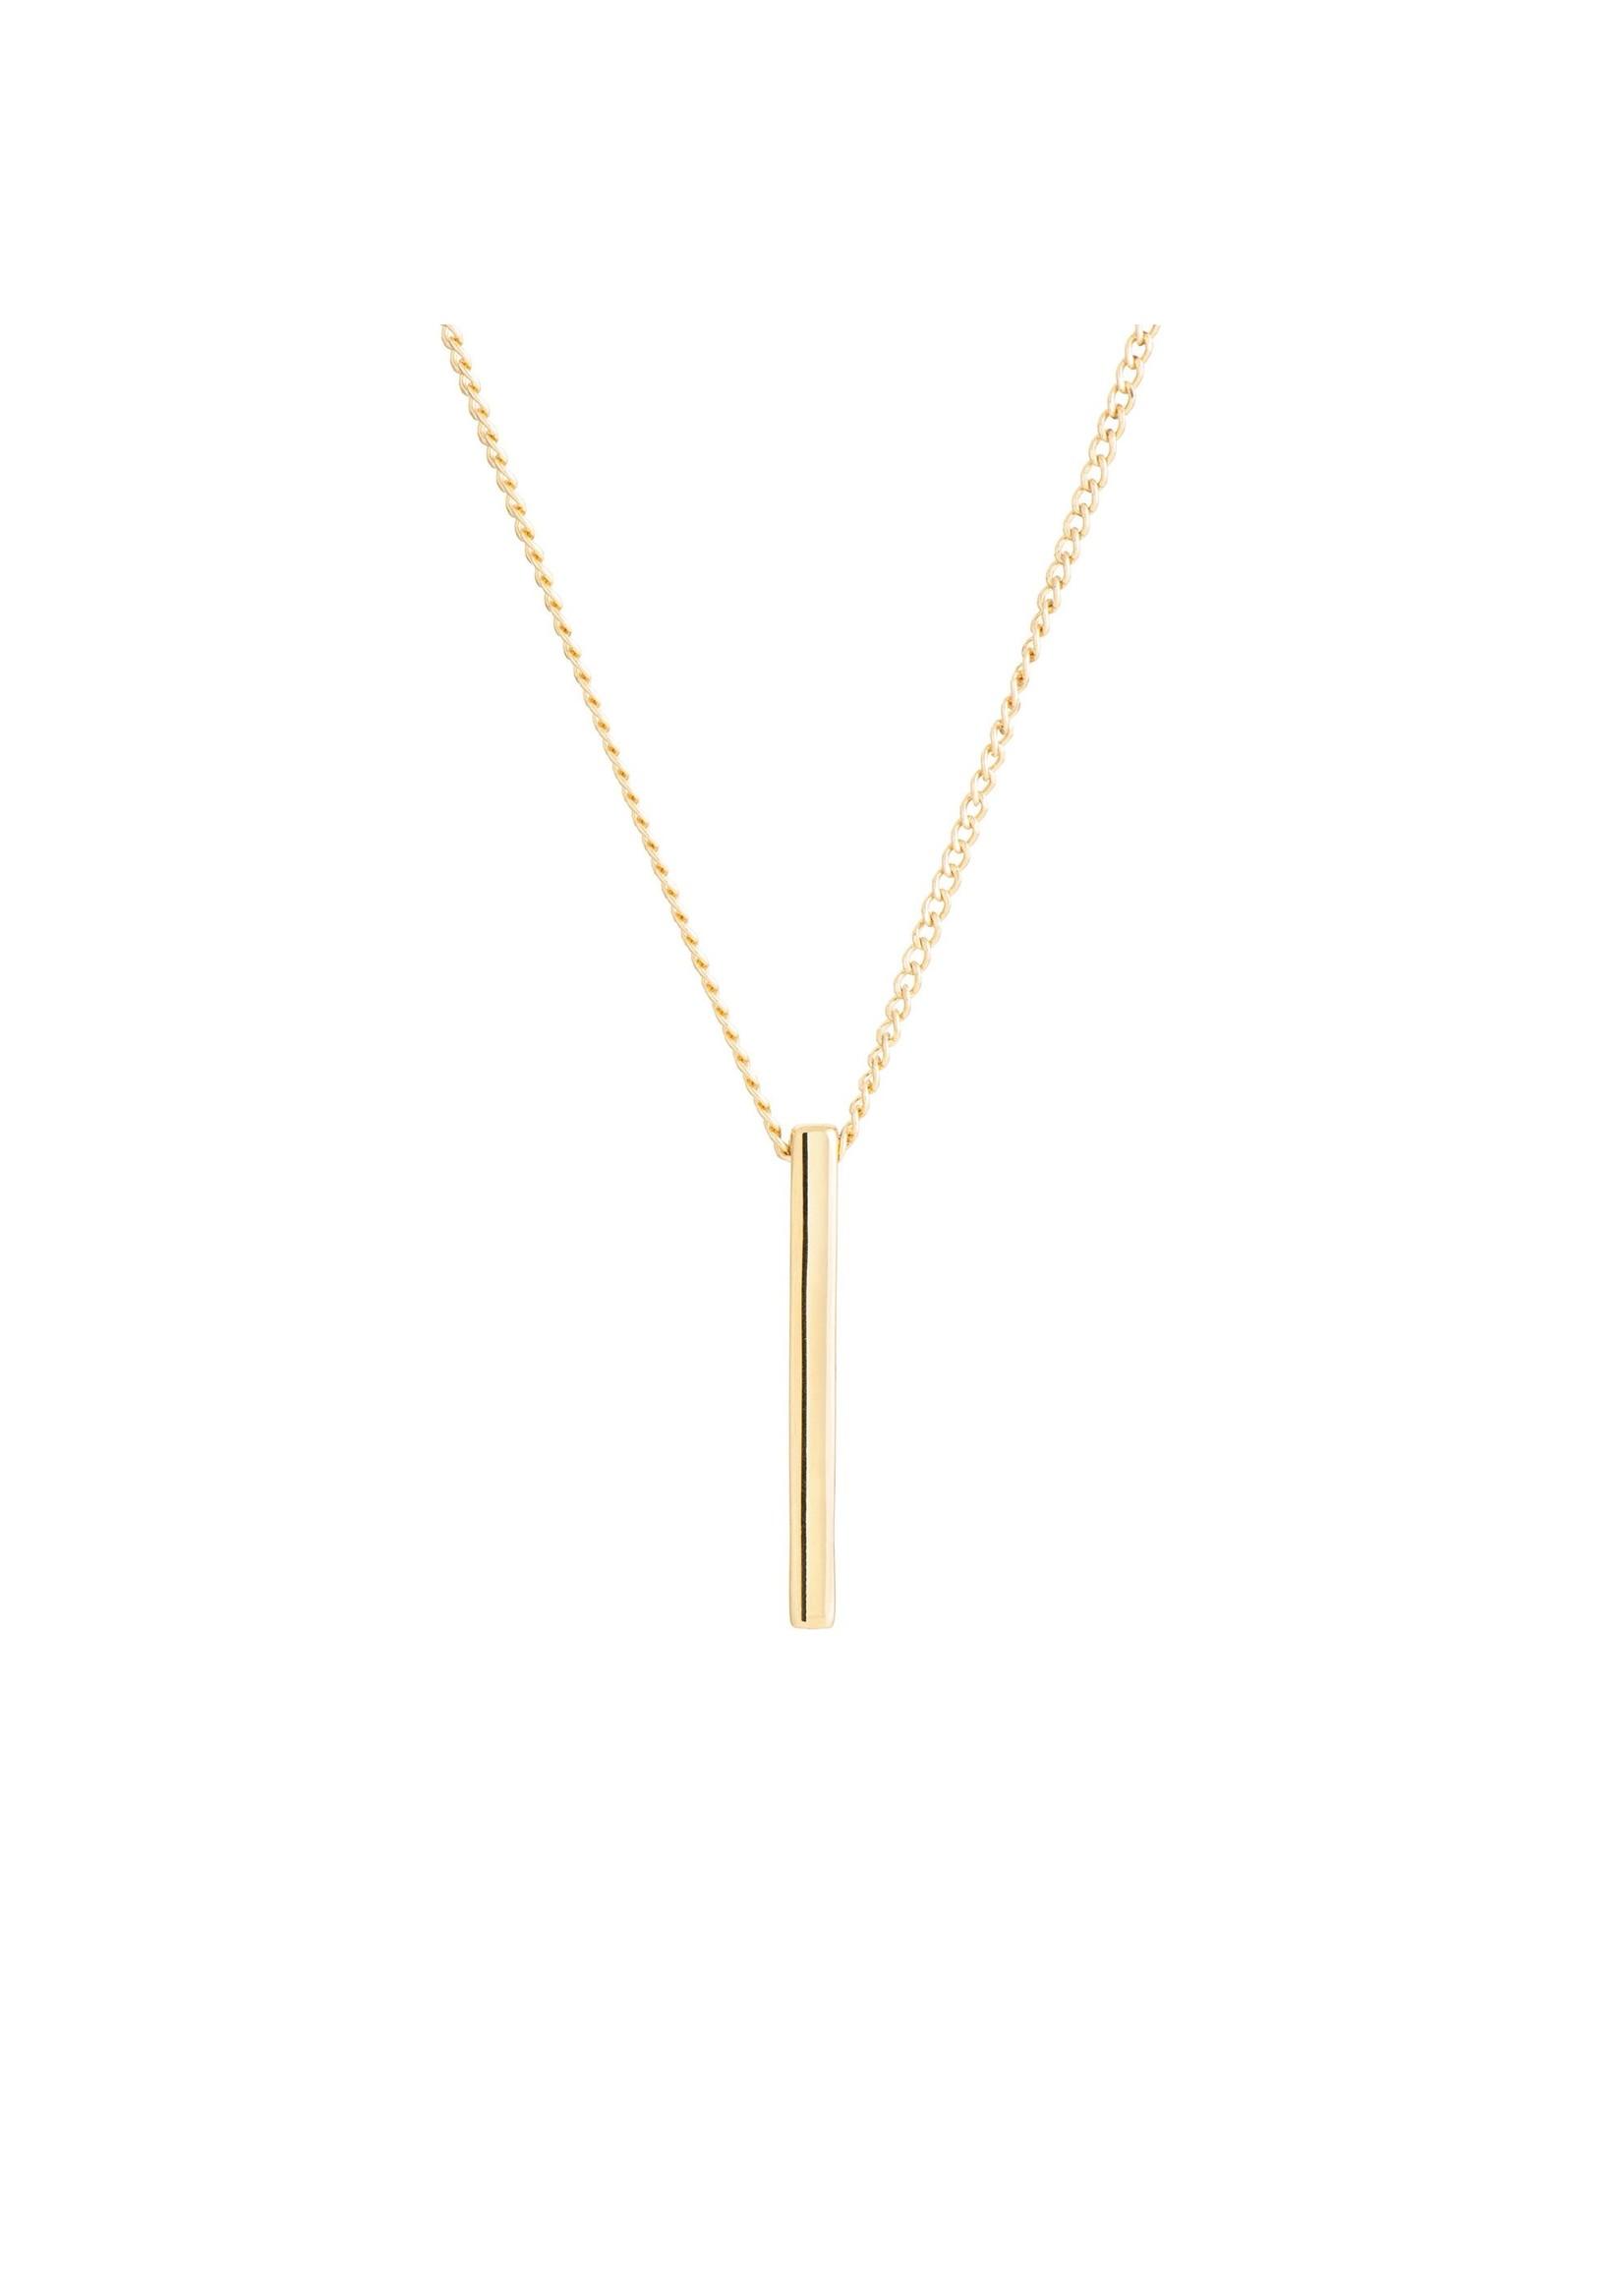 Match Stick Pendant - Gold